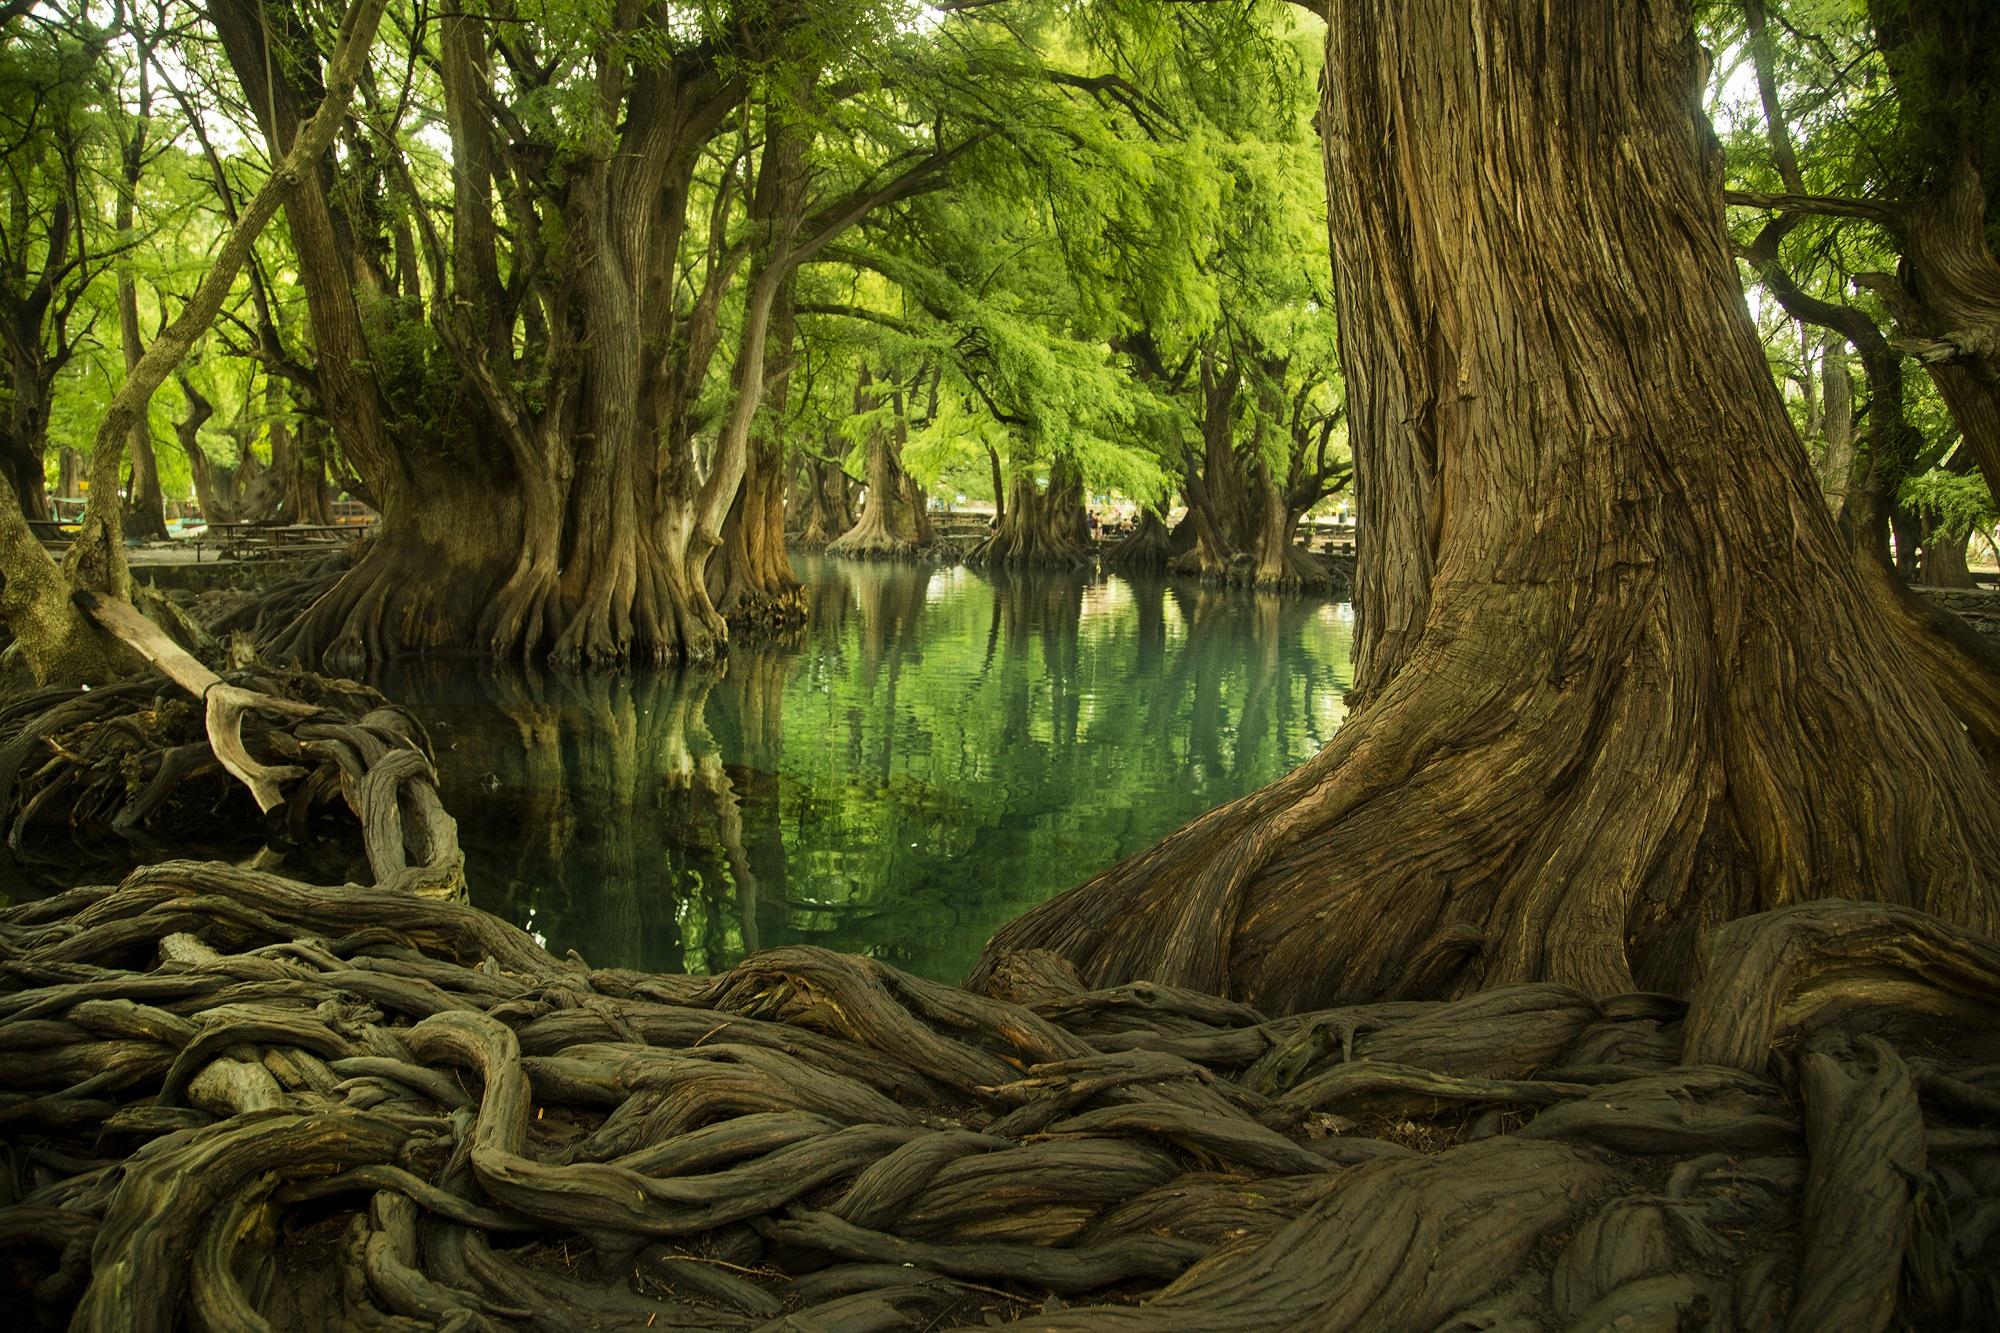 vista del lago de camecuaro